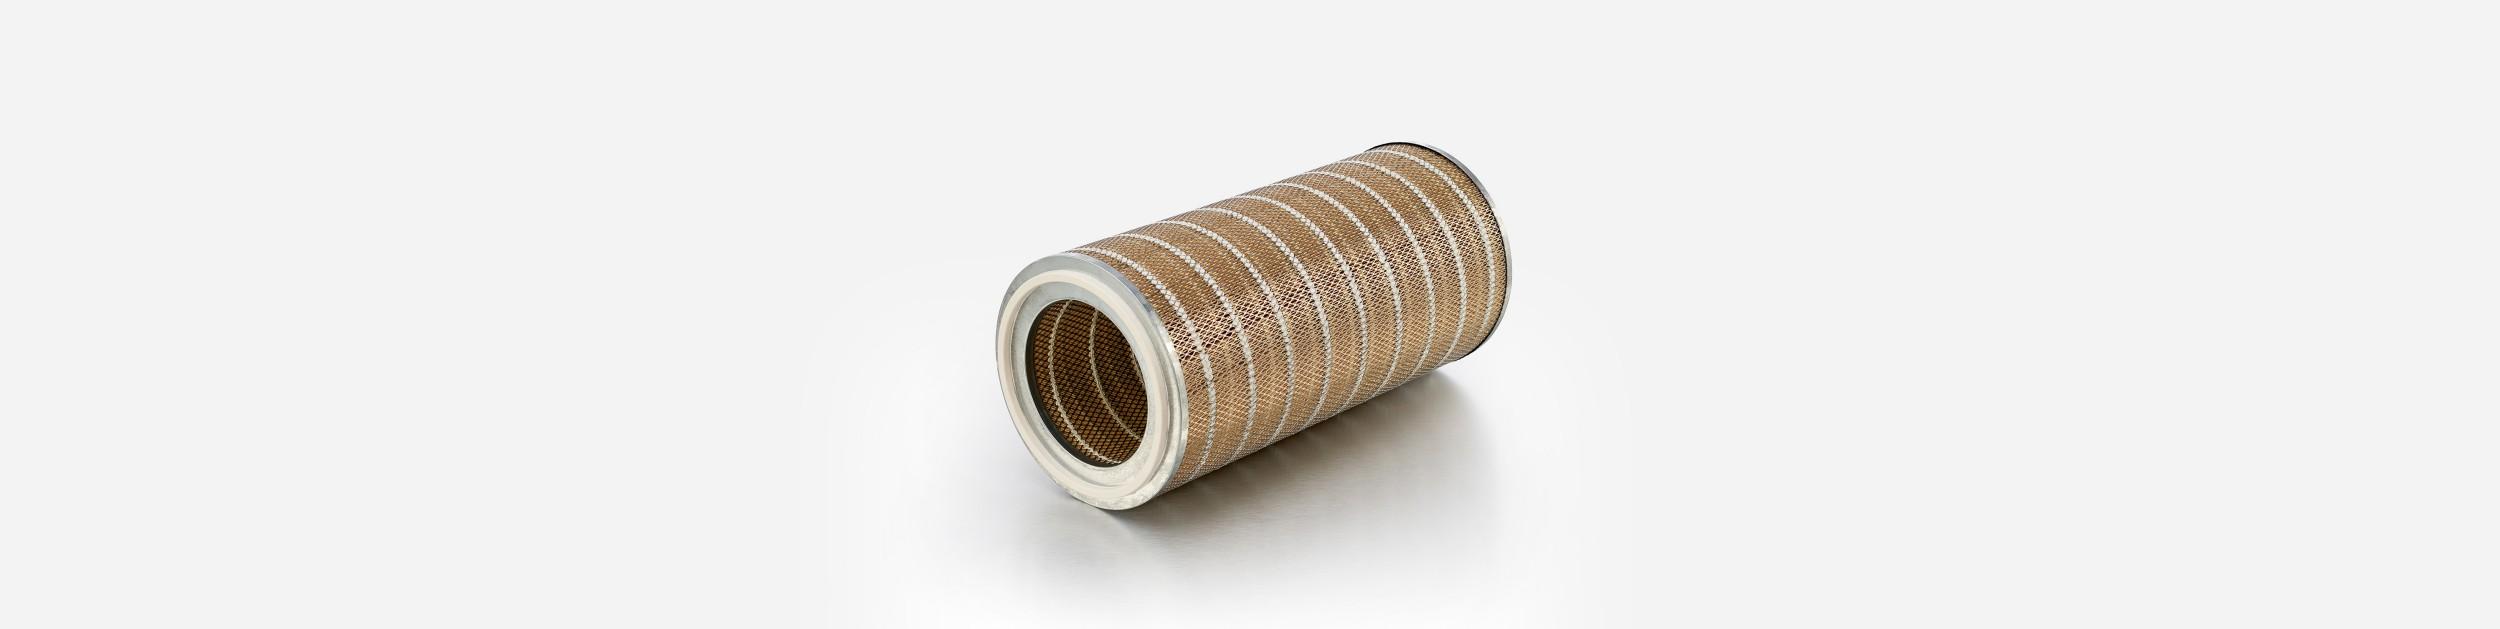 Donaldson Specialty Cartridge Filter Hero Image | AIRPLUS Industrial